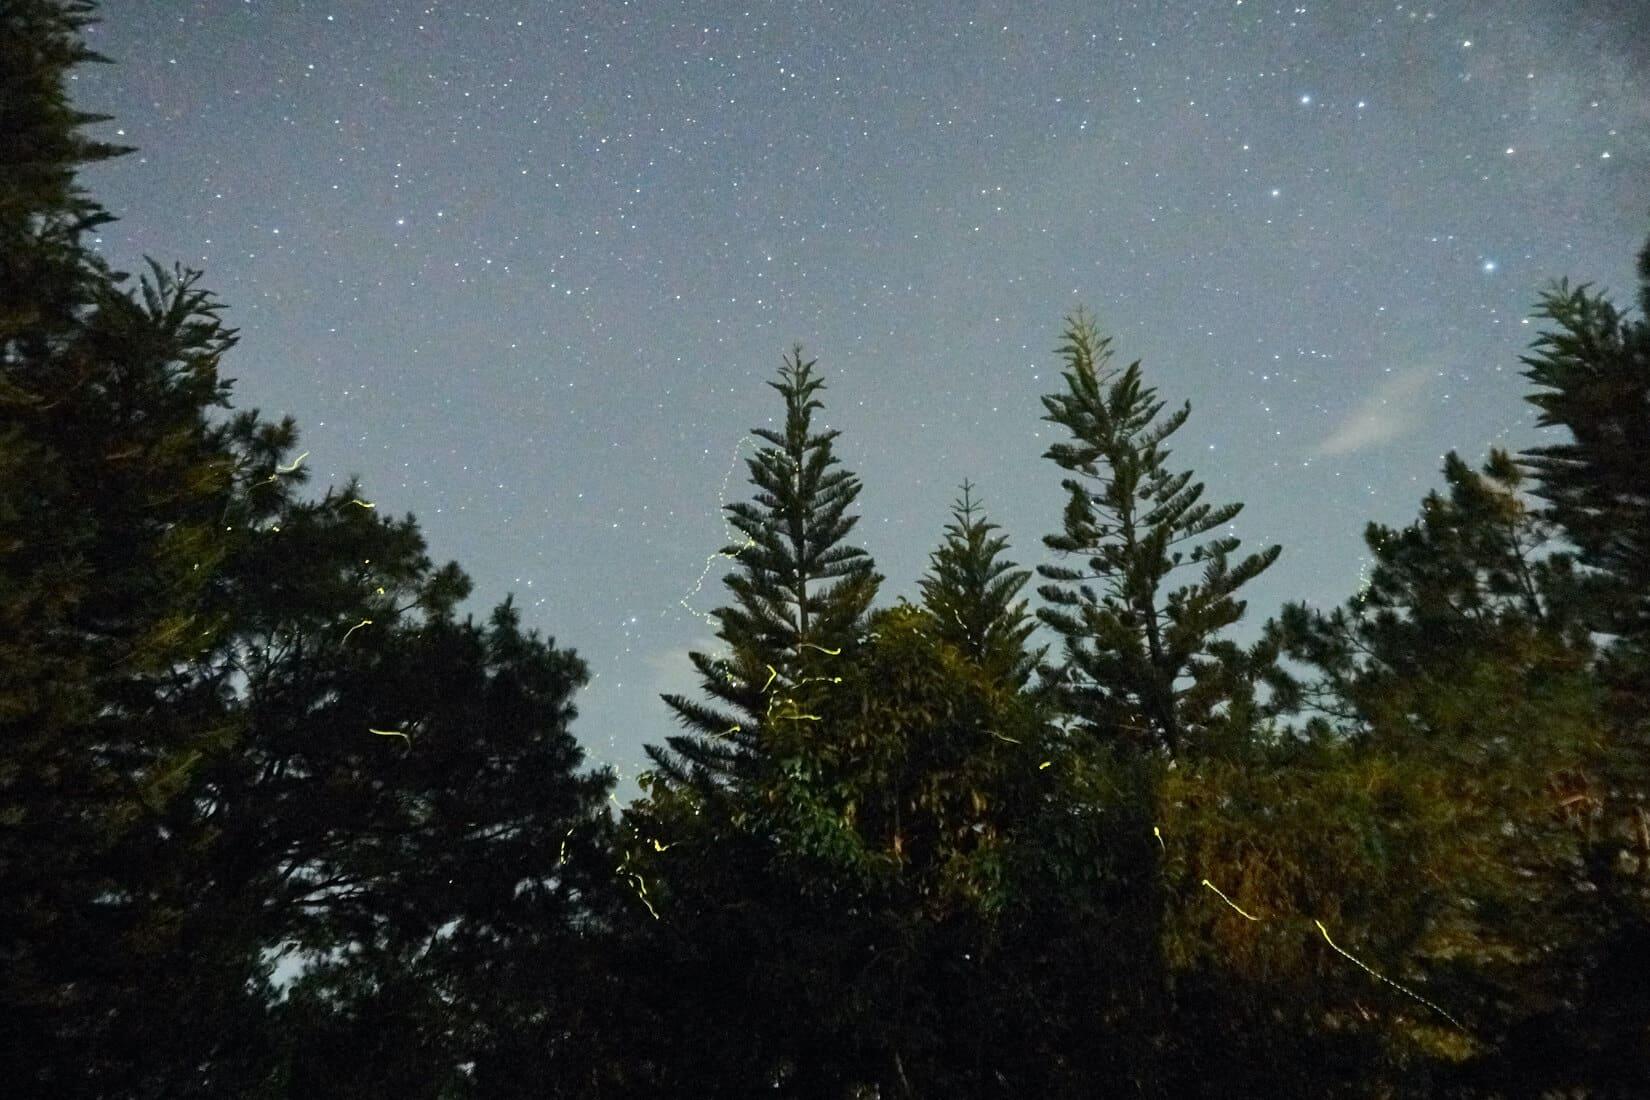 Frangeli House Fireflies Baguio 0